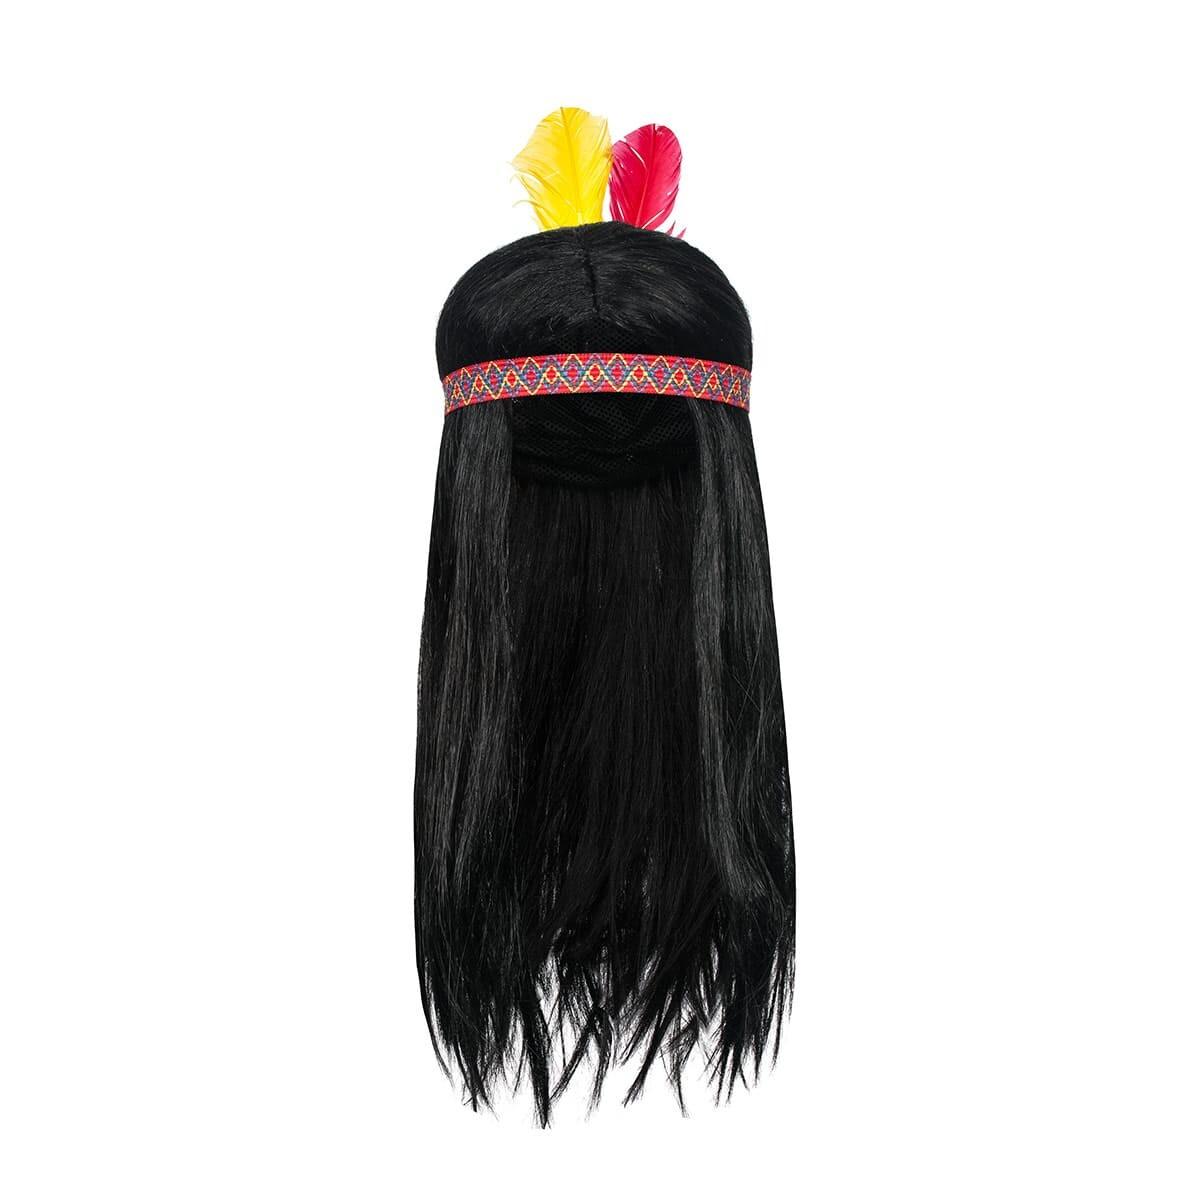 indianer peruecke kinder jungen kostuem accessoire